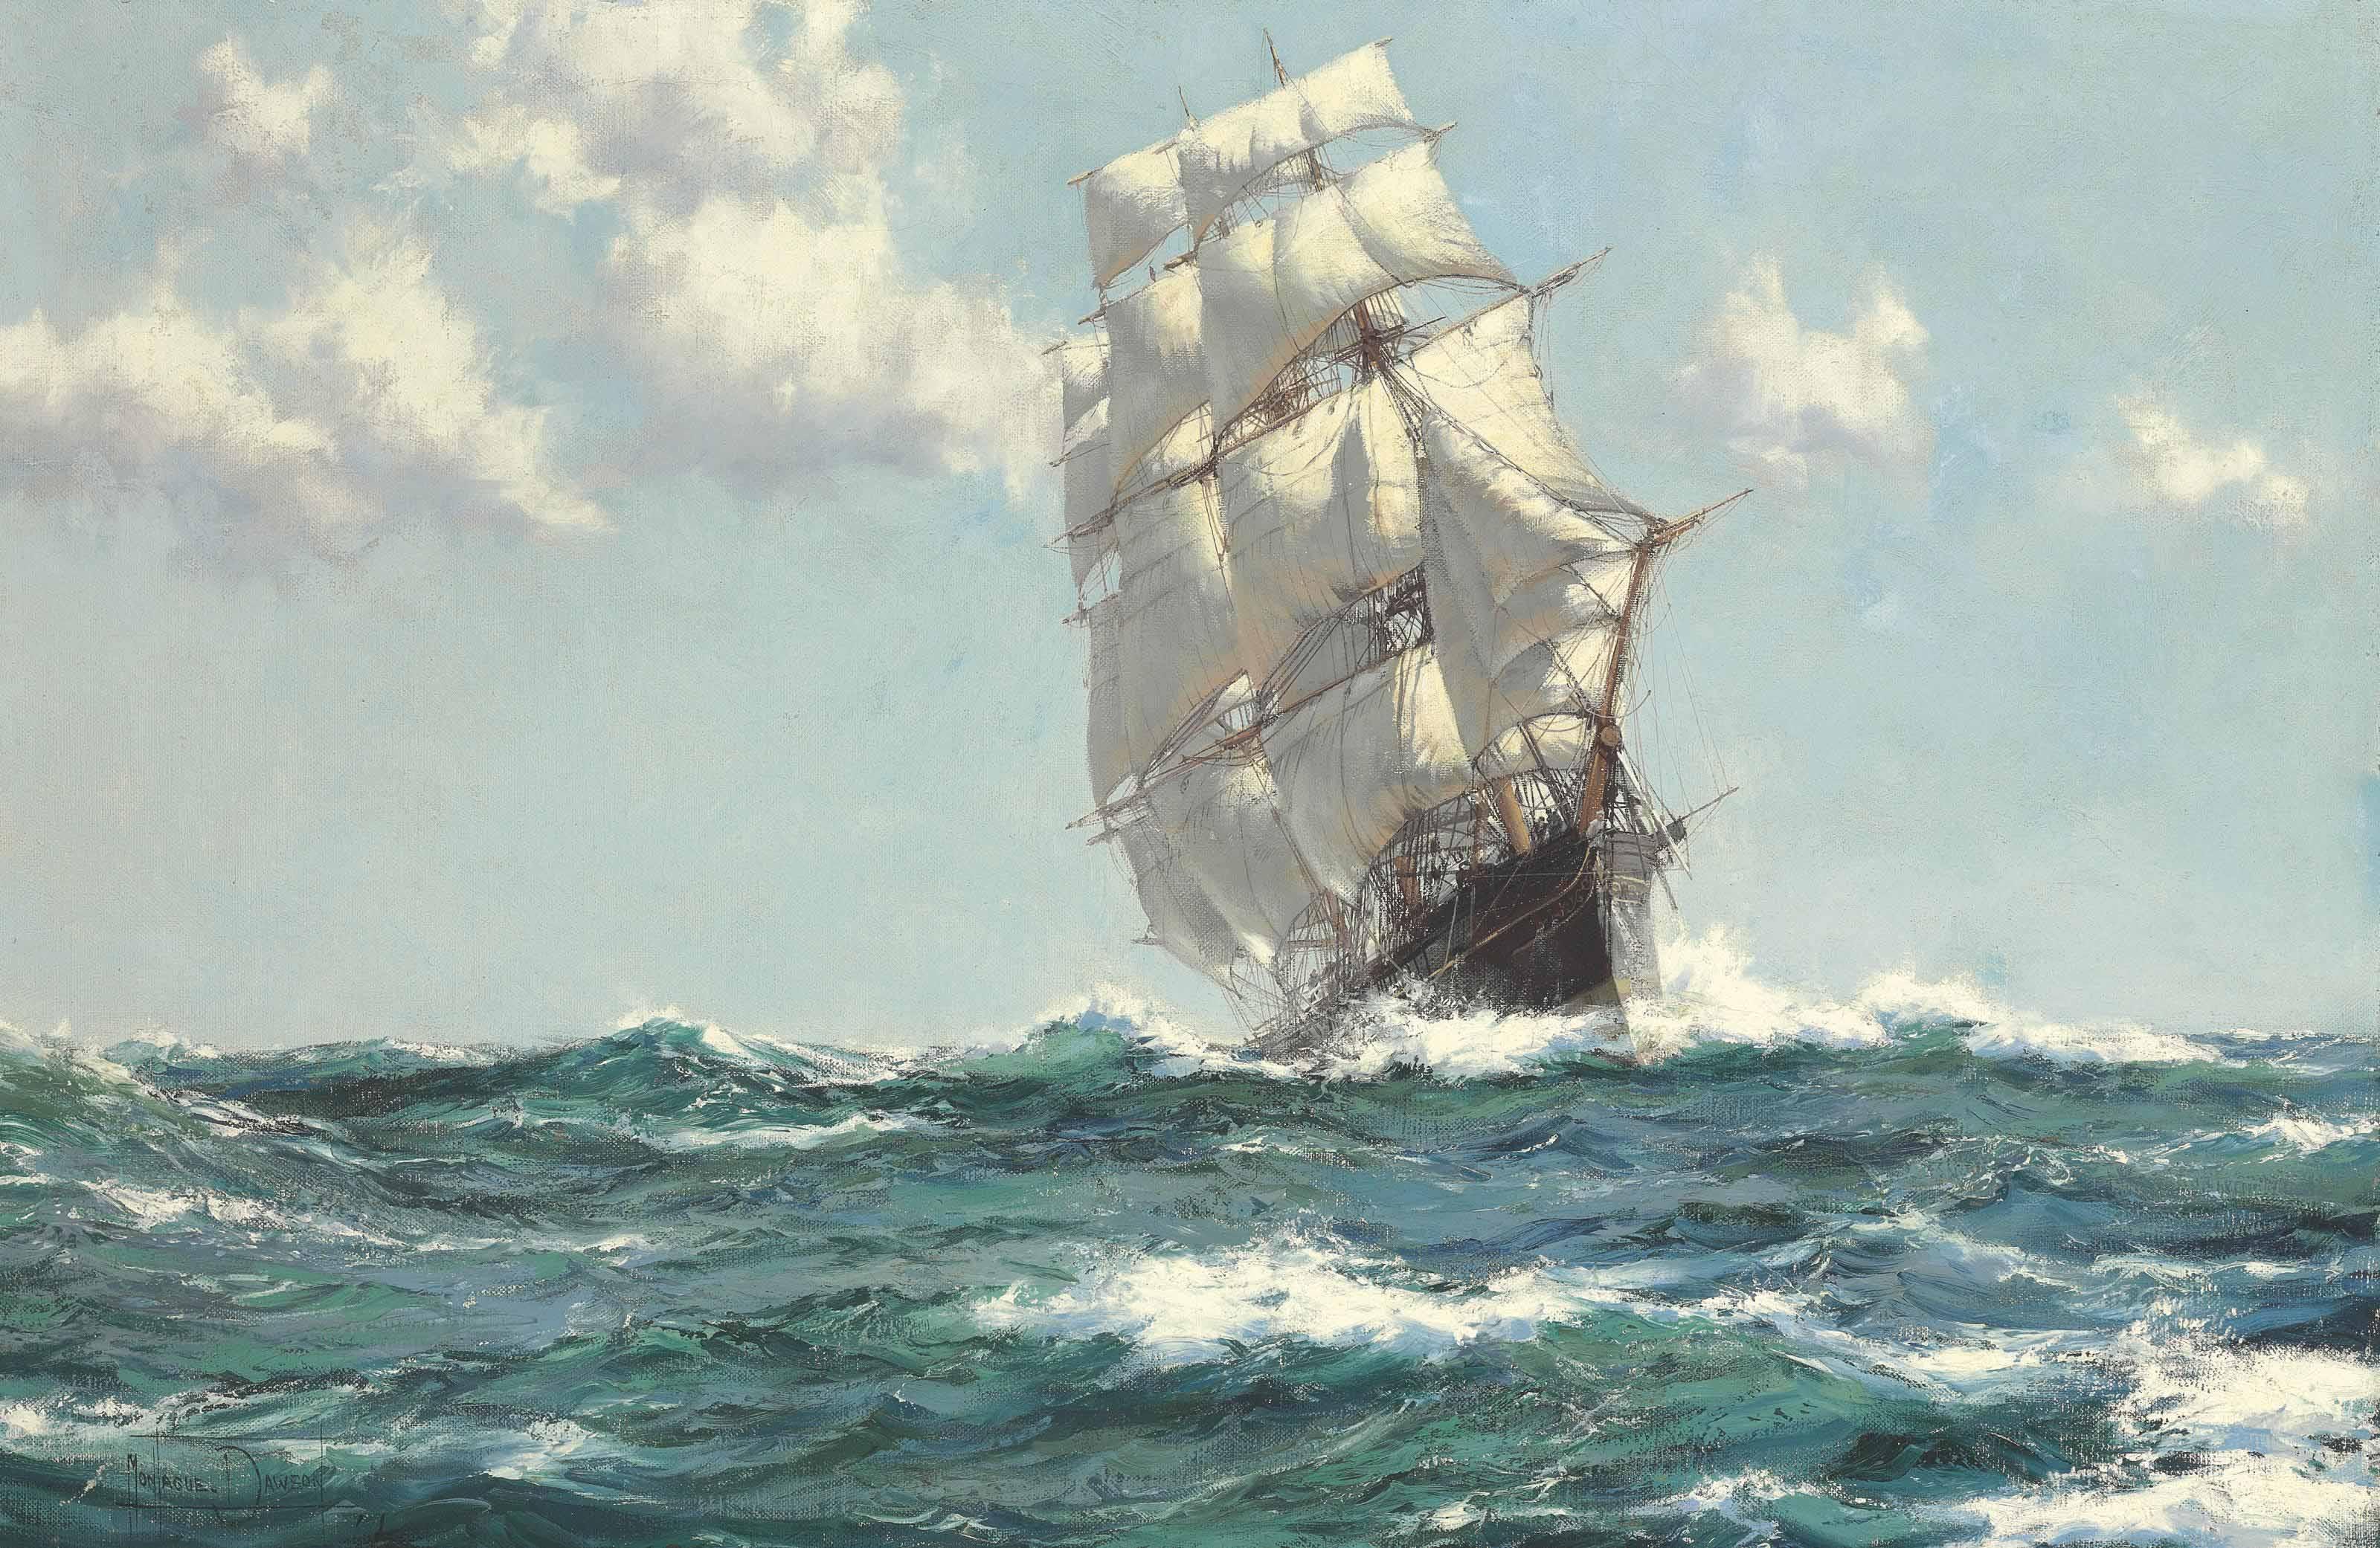 Sea Beauty - The Tea Clipper 'Wild Ranger'